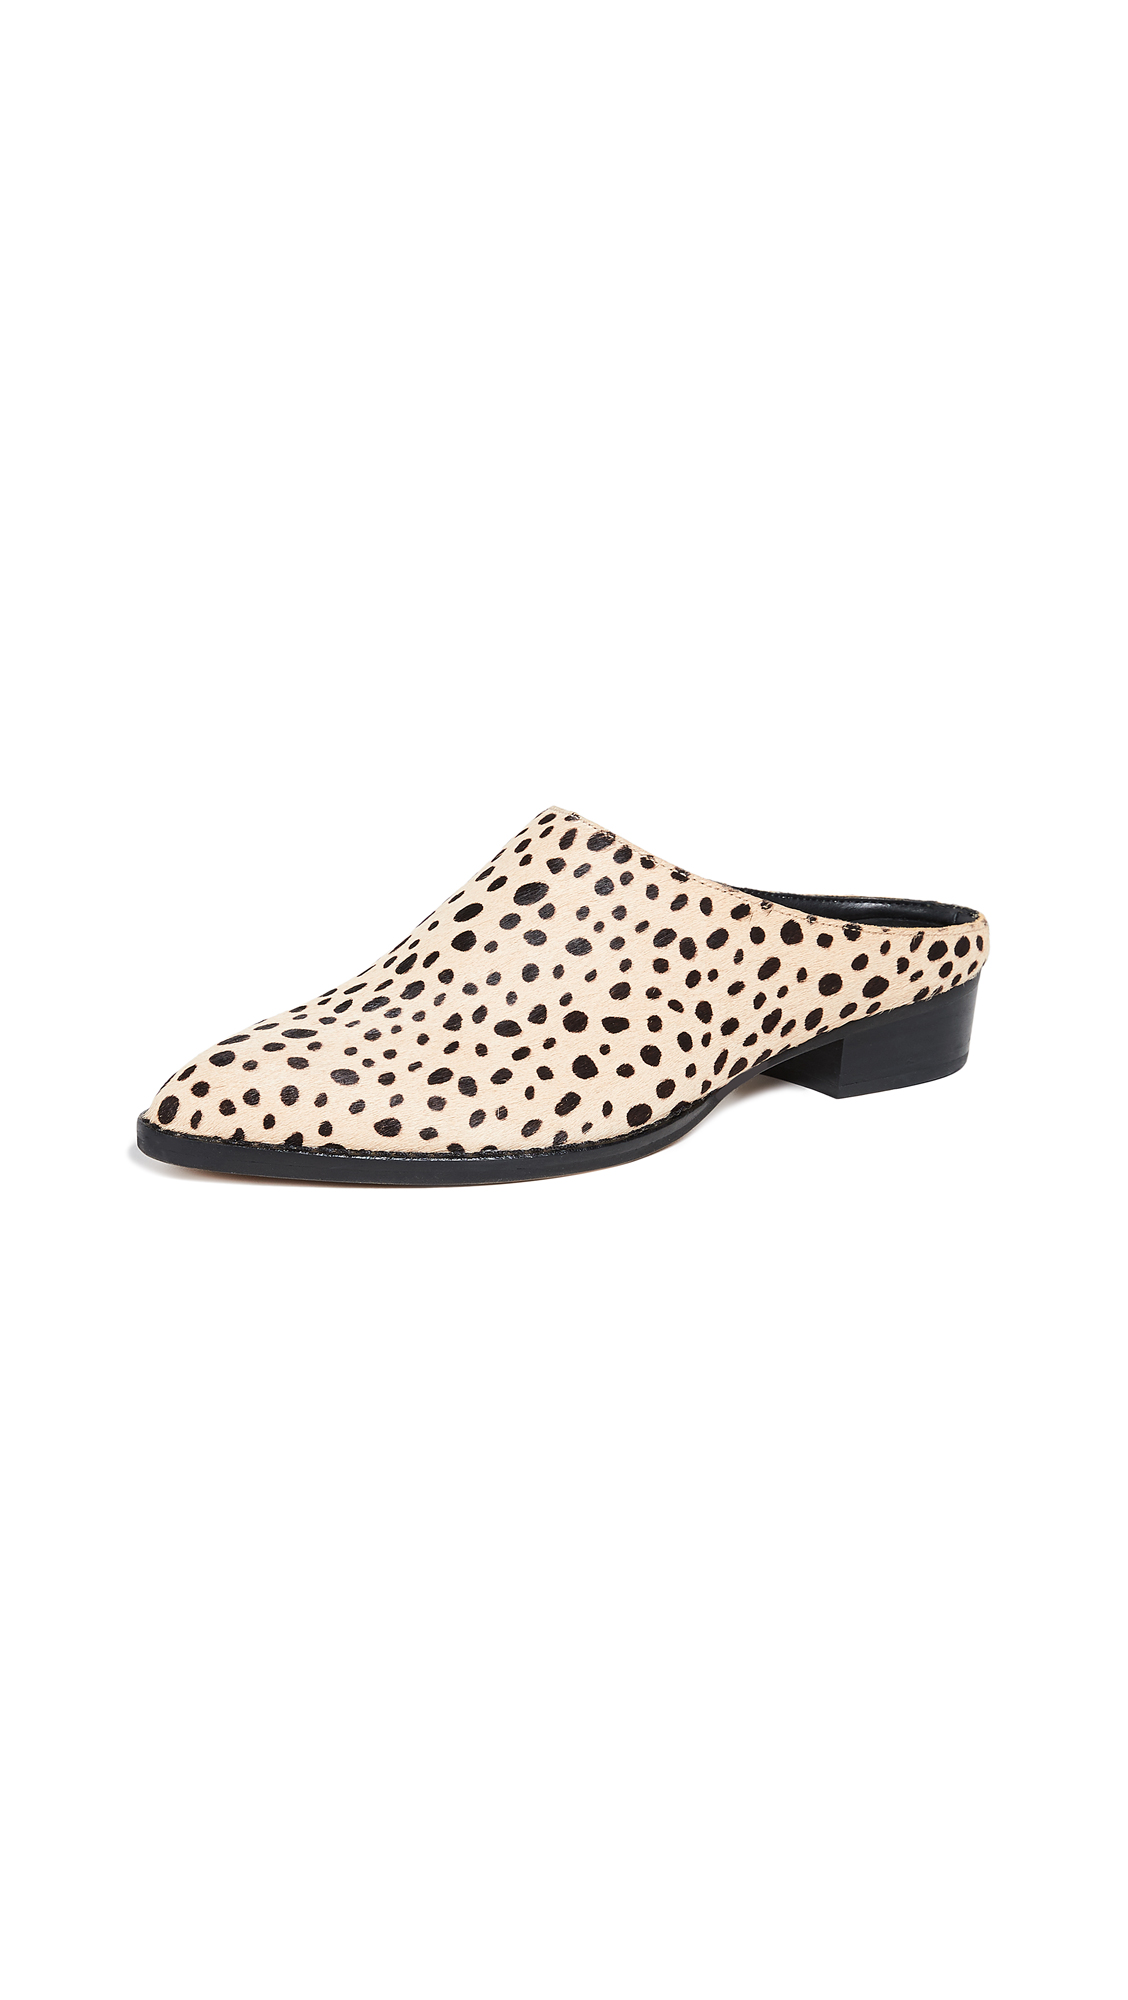 Dolce Vita Aven Point Toe Mules - Leopard